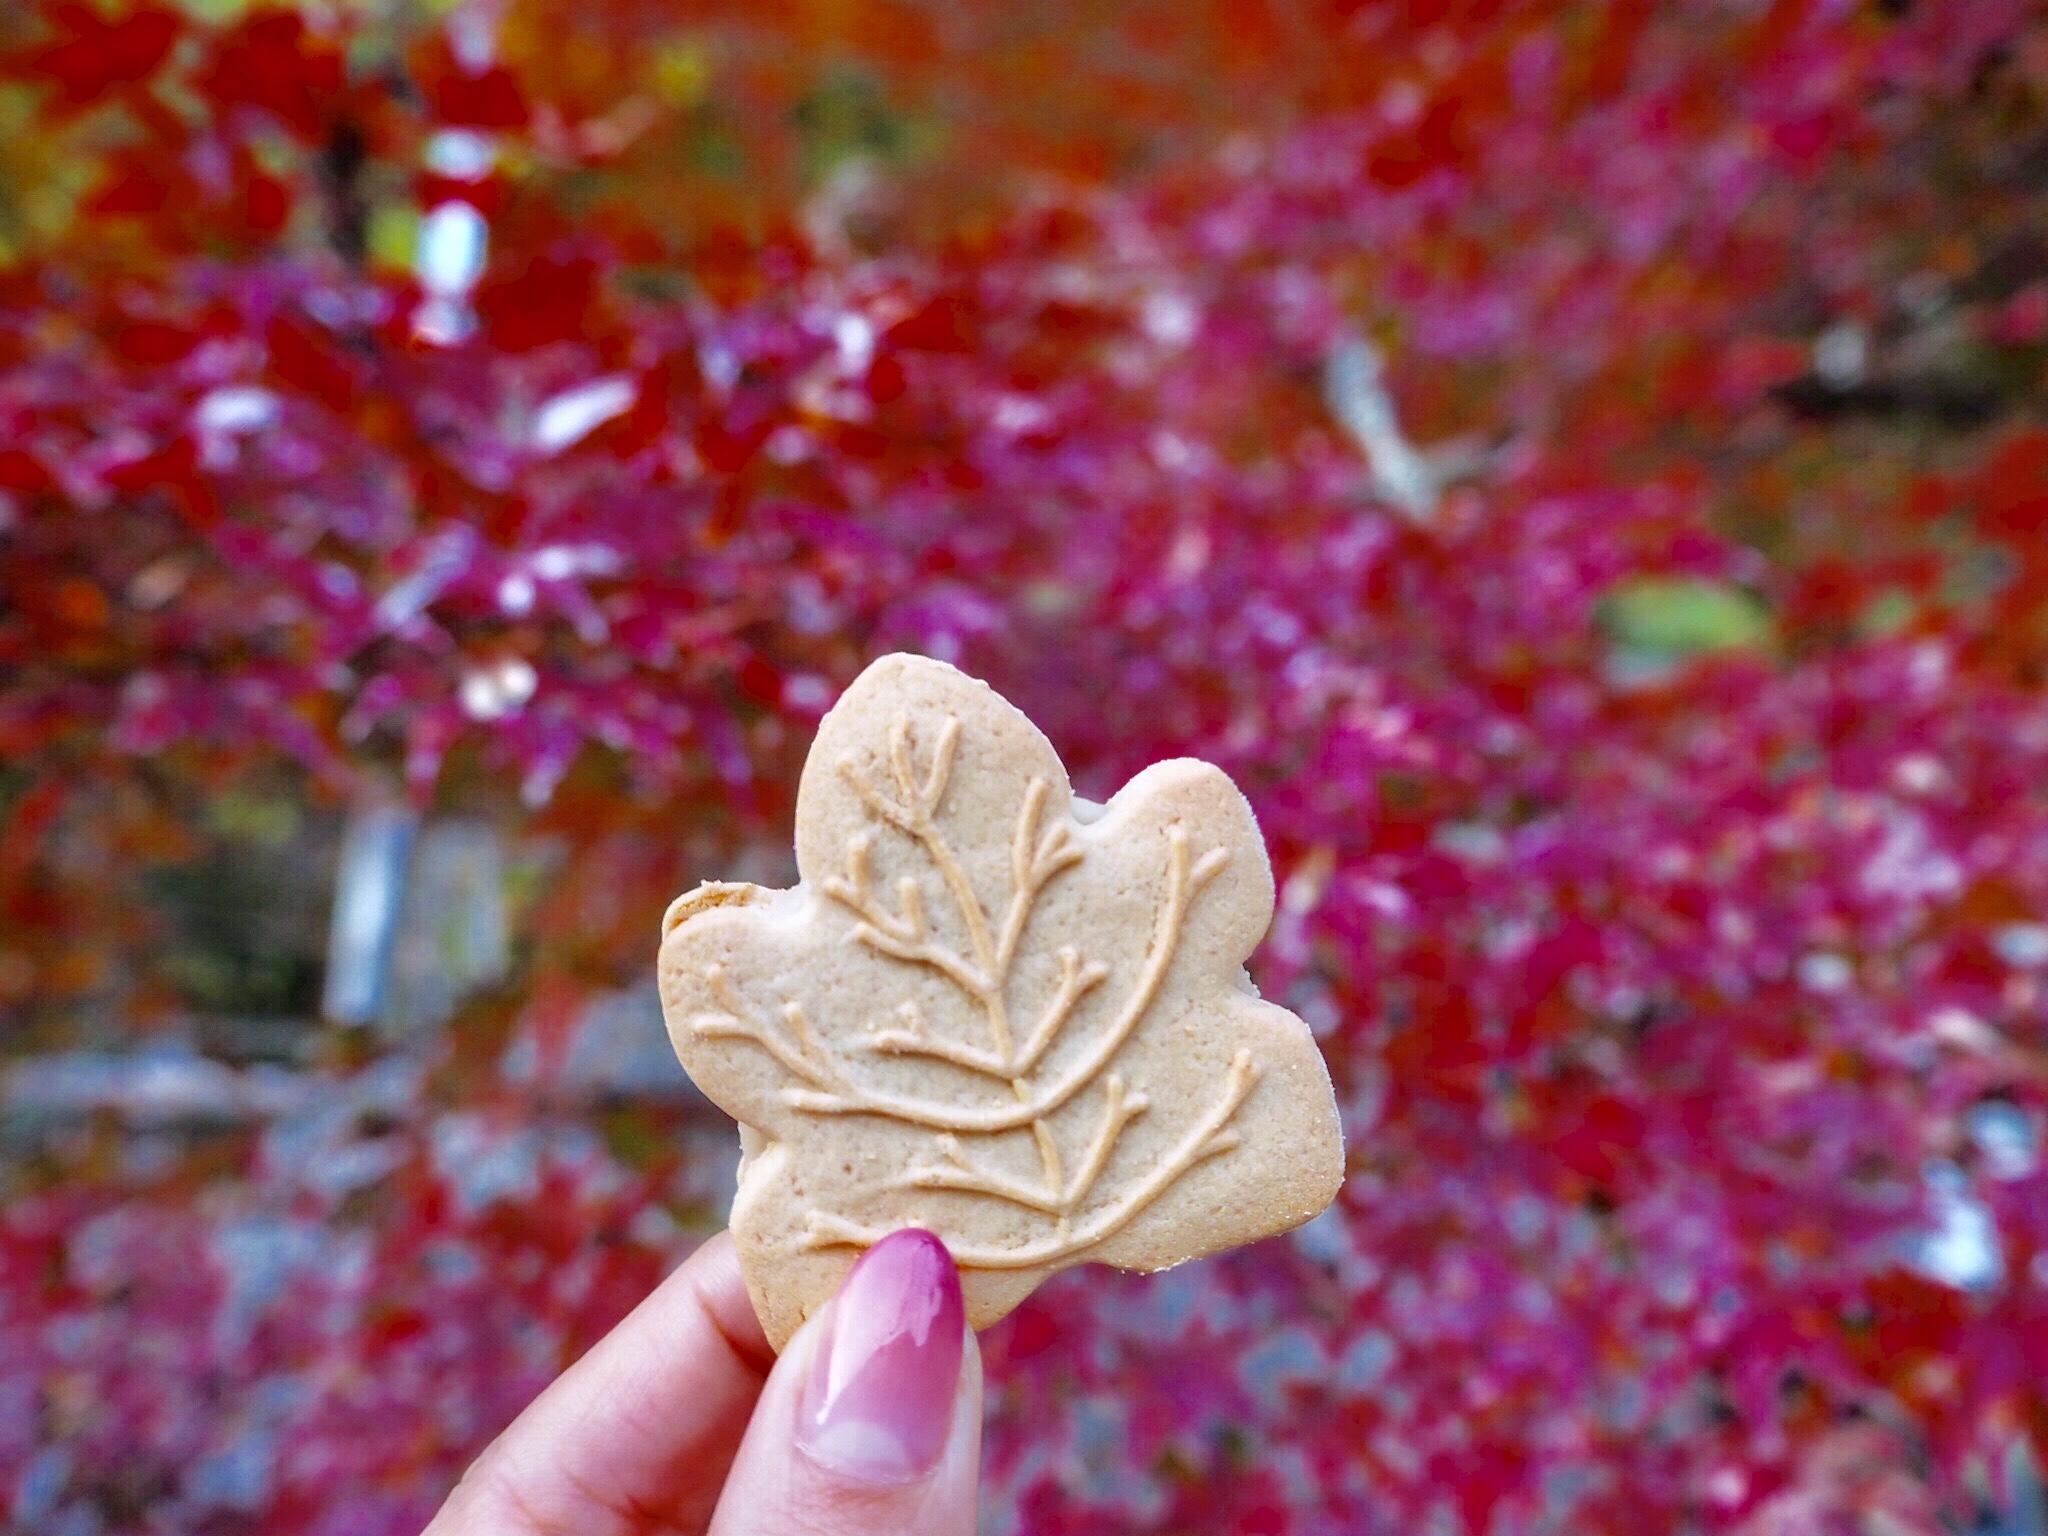 img 7541 - 香嵐渓 - 日本の秋を感じる 愛知県豊田市の紅葉スポット